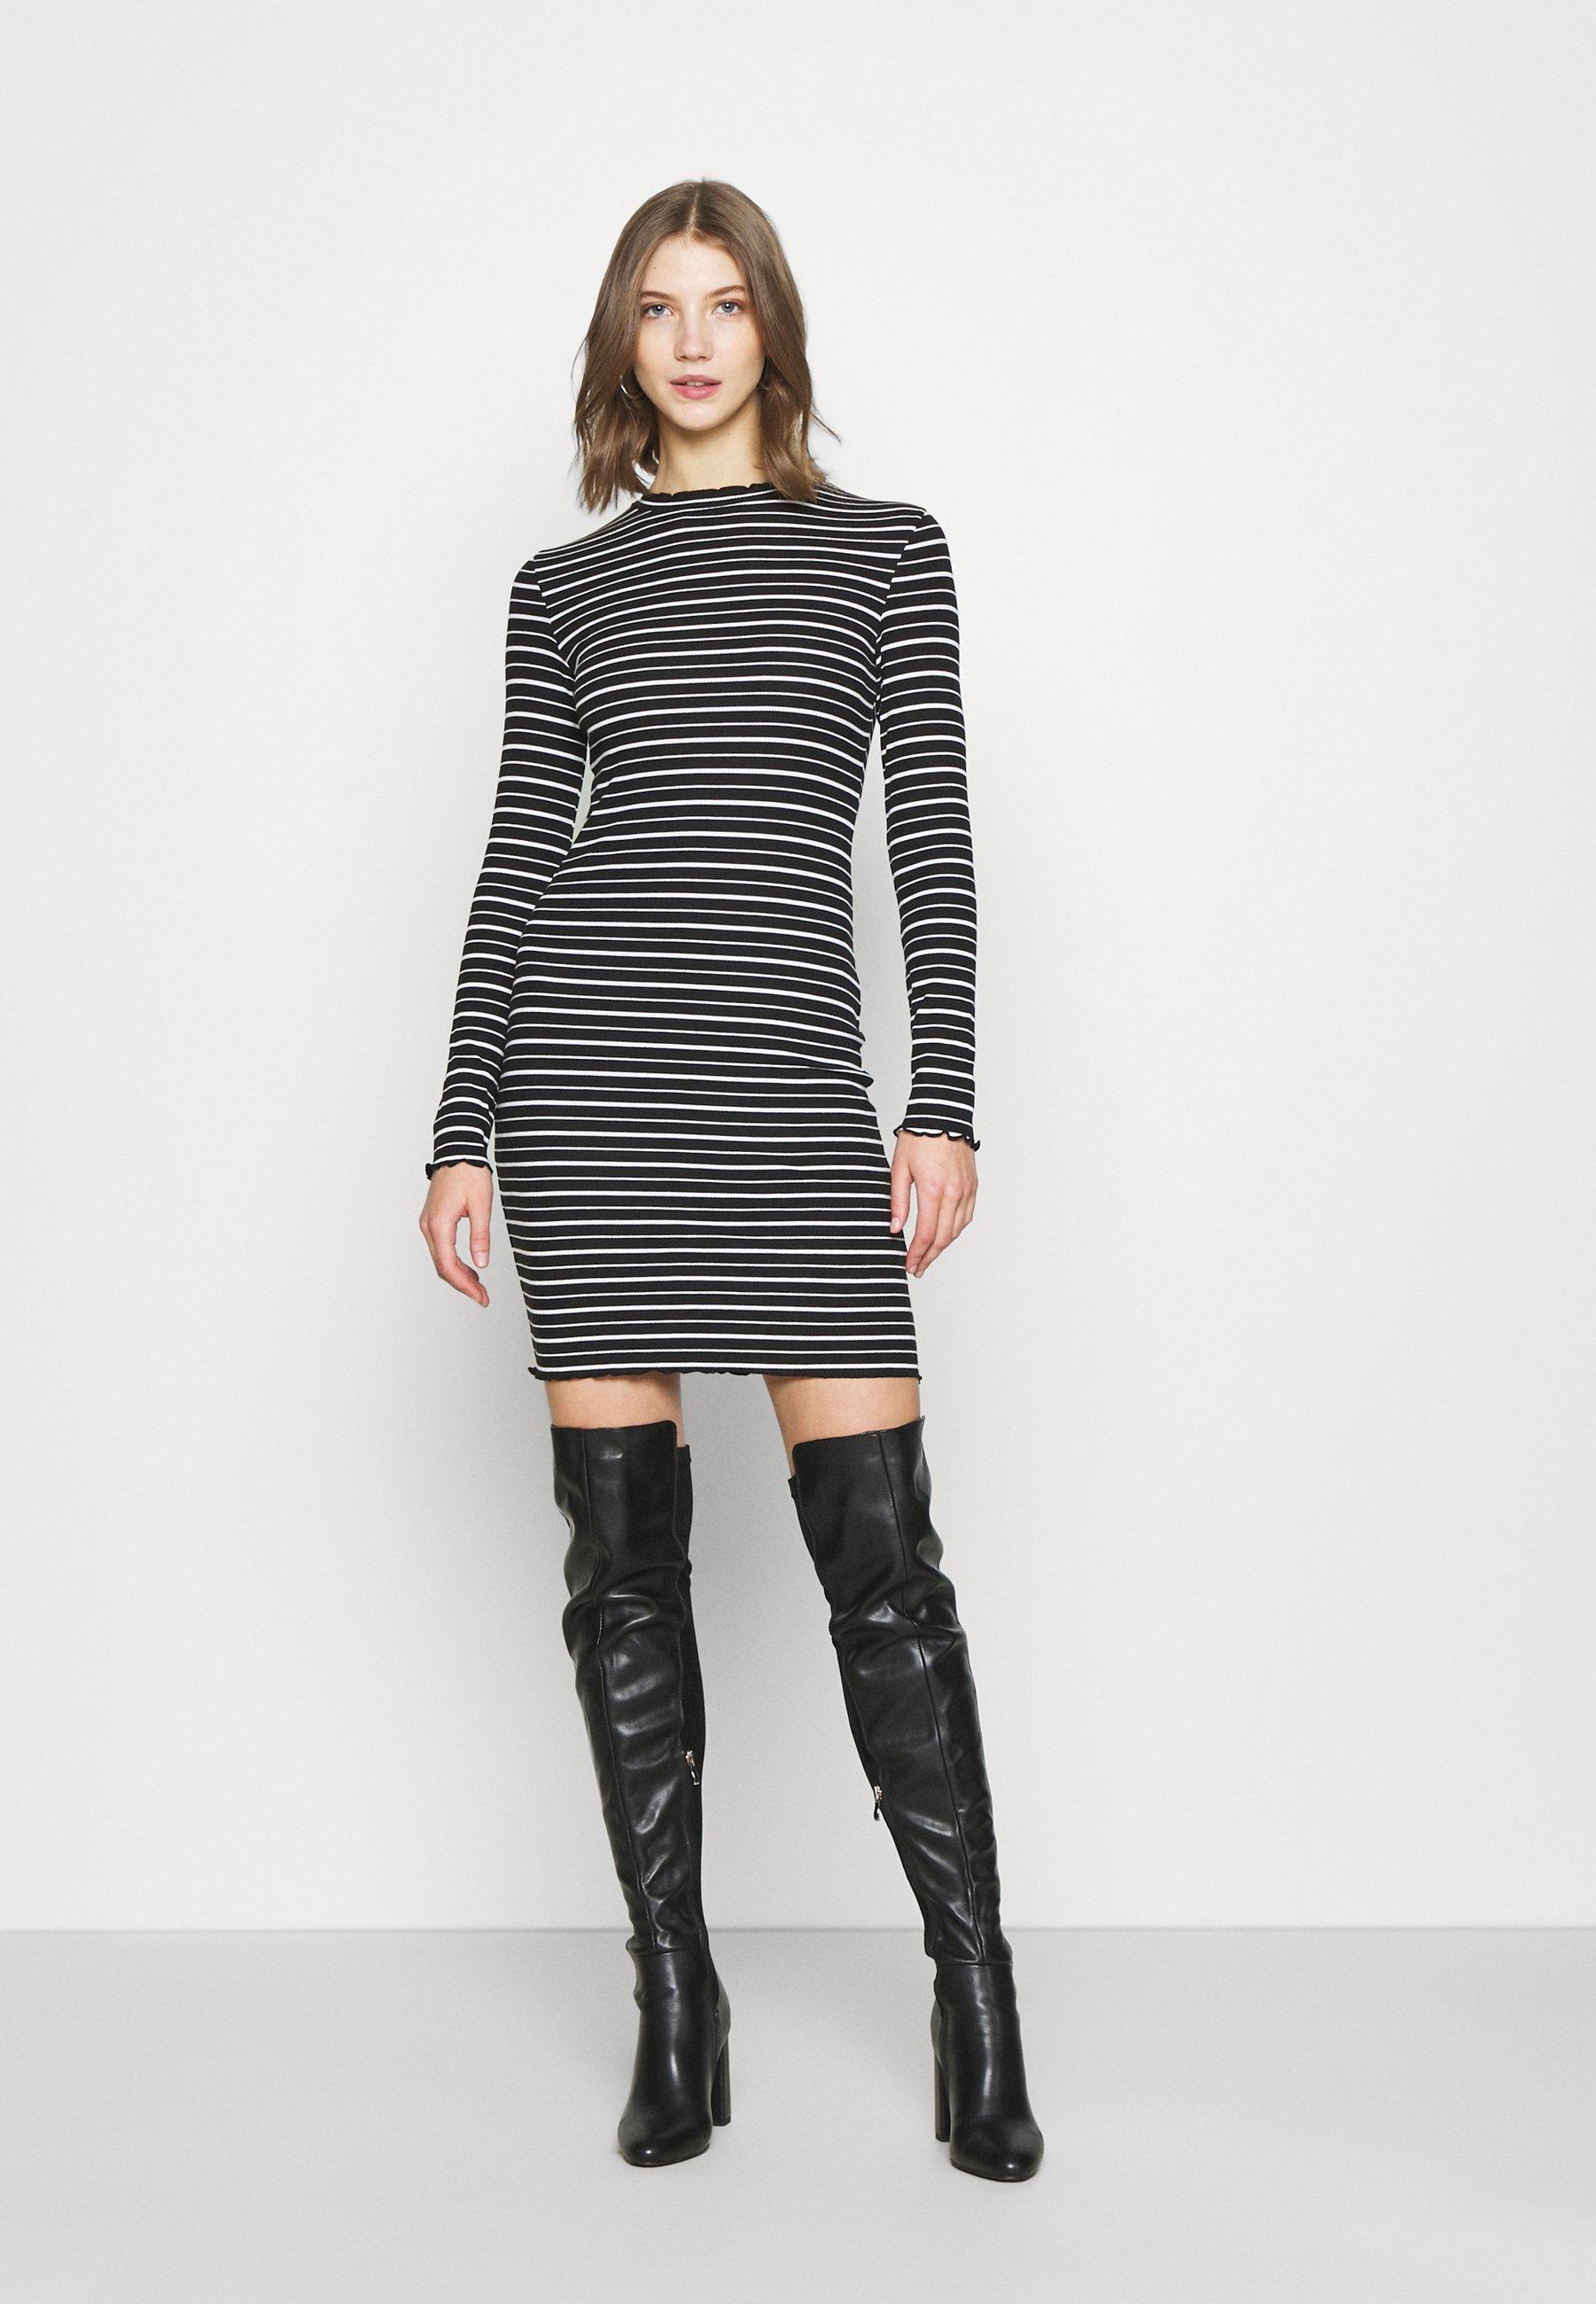 Women Rushed edges mini high neck long sleeves dress - Shift dress